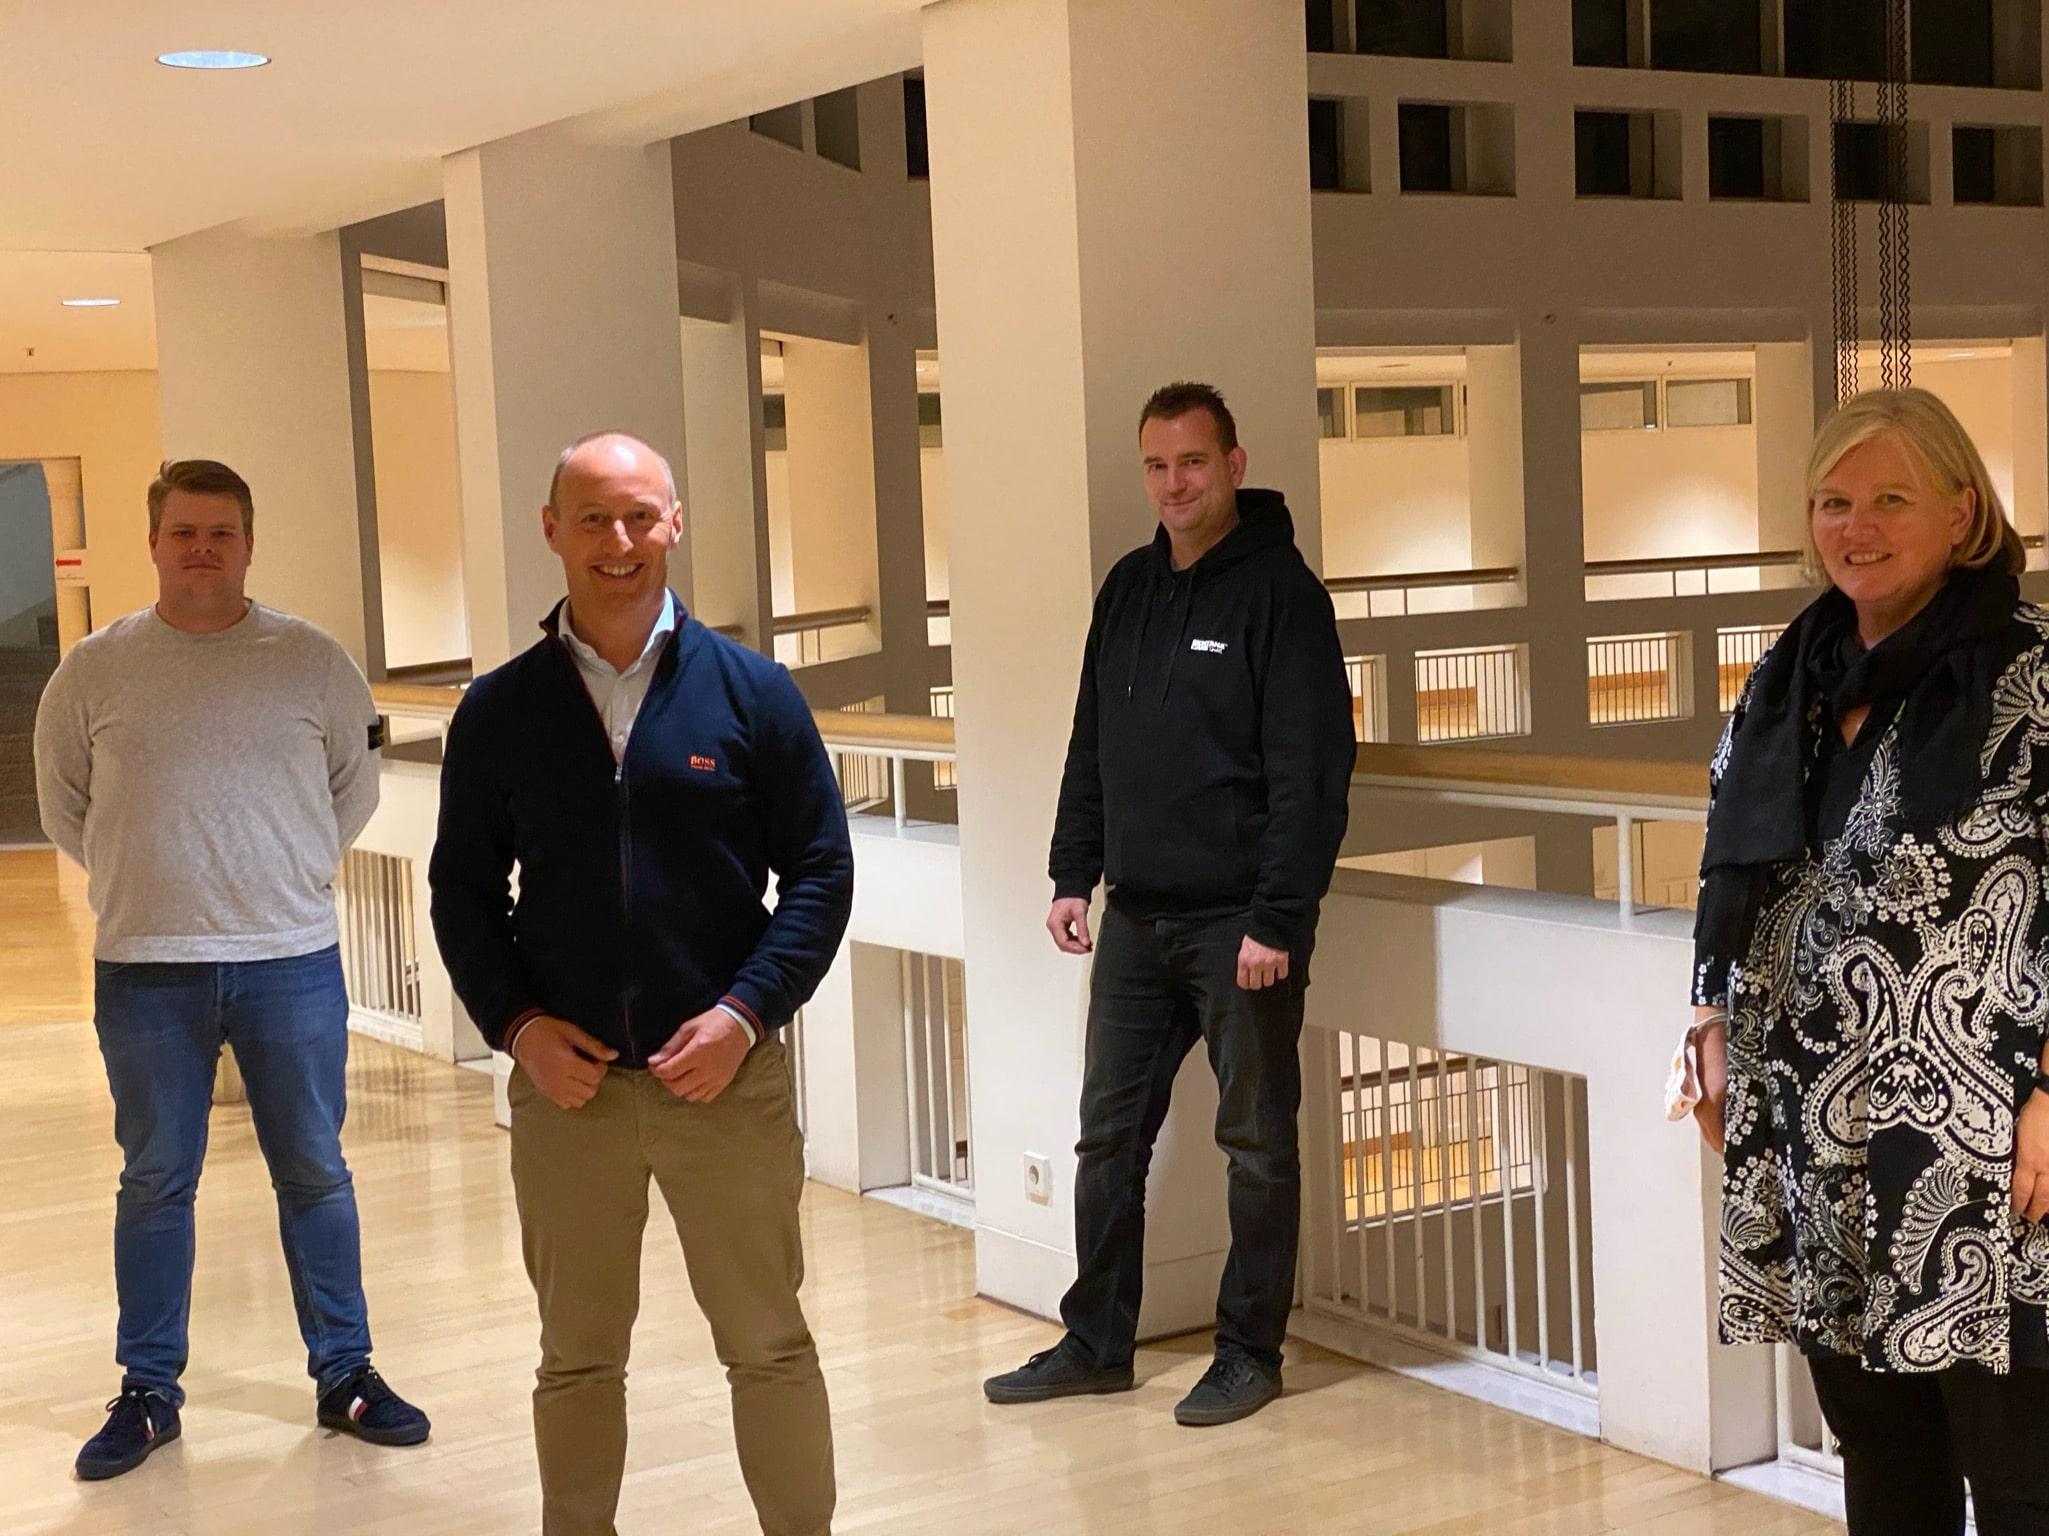 Die Ratsmitglieder der FDP/Bürgerliste. (v. l.) Philip Schmidtke-Mönkediek, Michael Kauch, Markus Happe und Antje Joest. (Foto: Sven Görgens).